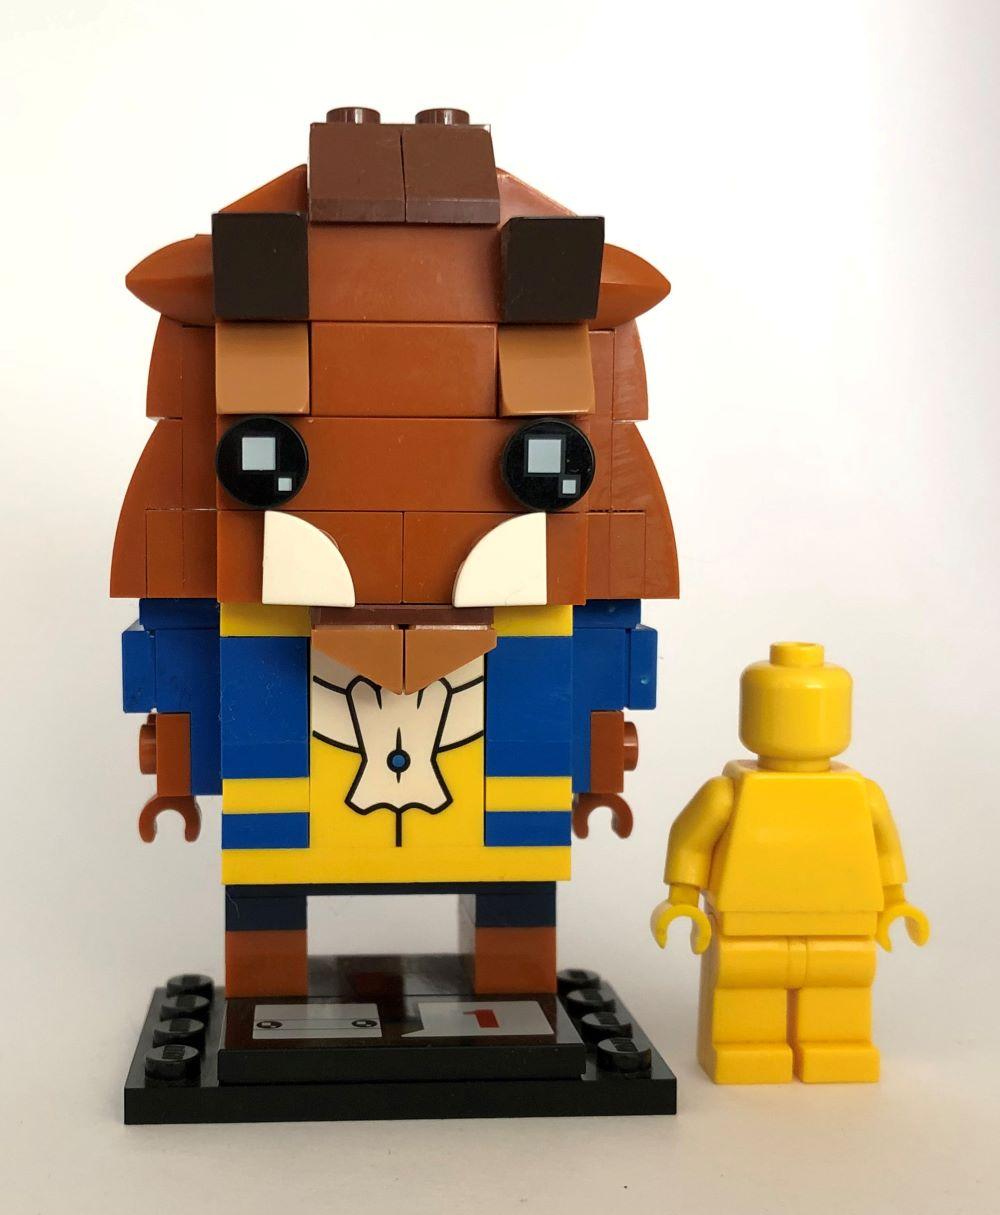 lego terimler sözlüğü lego brickheadz